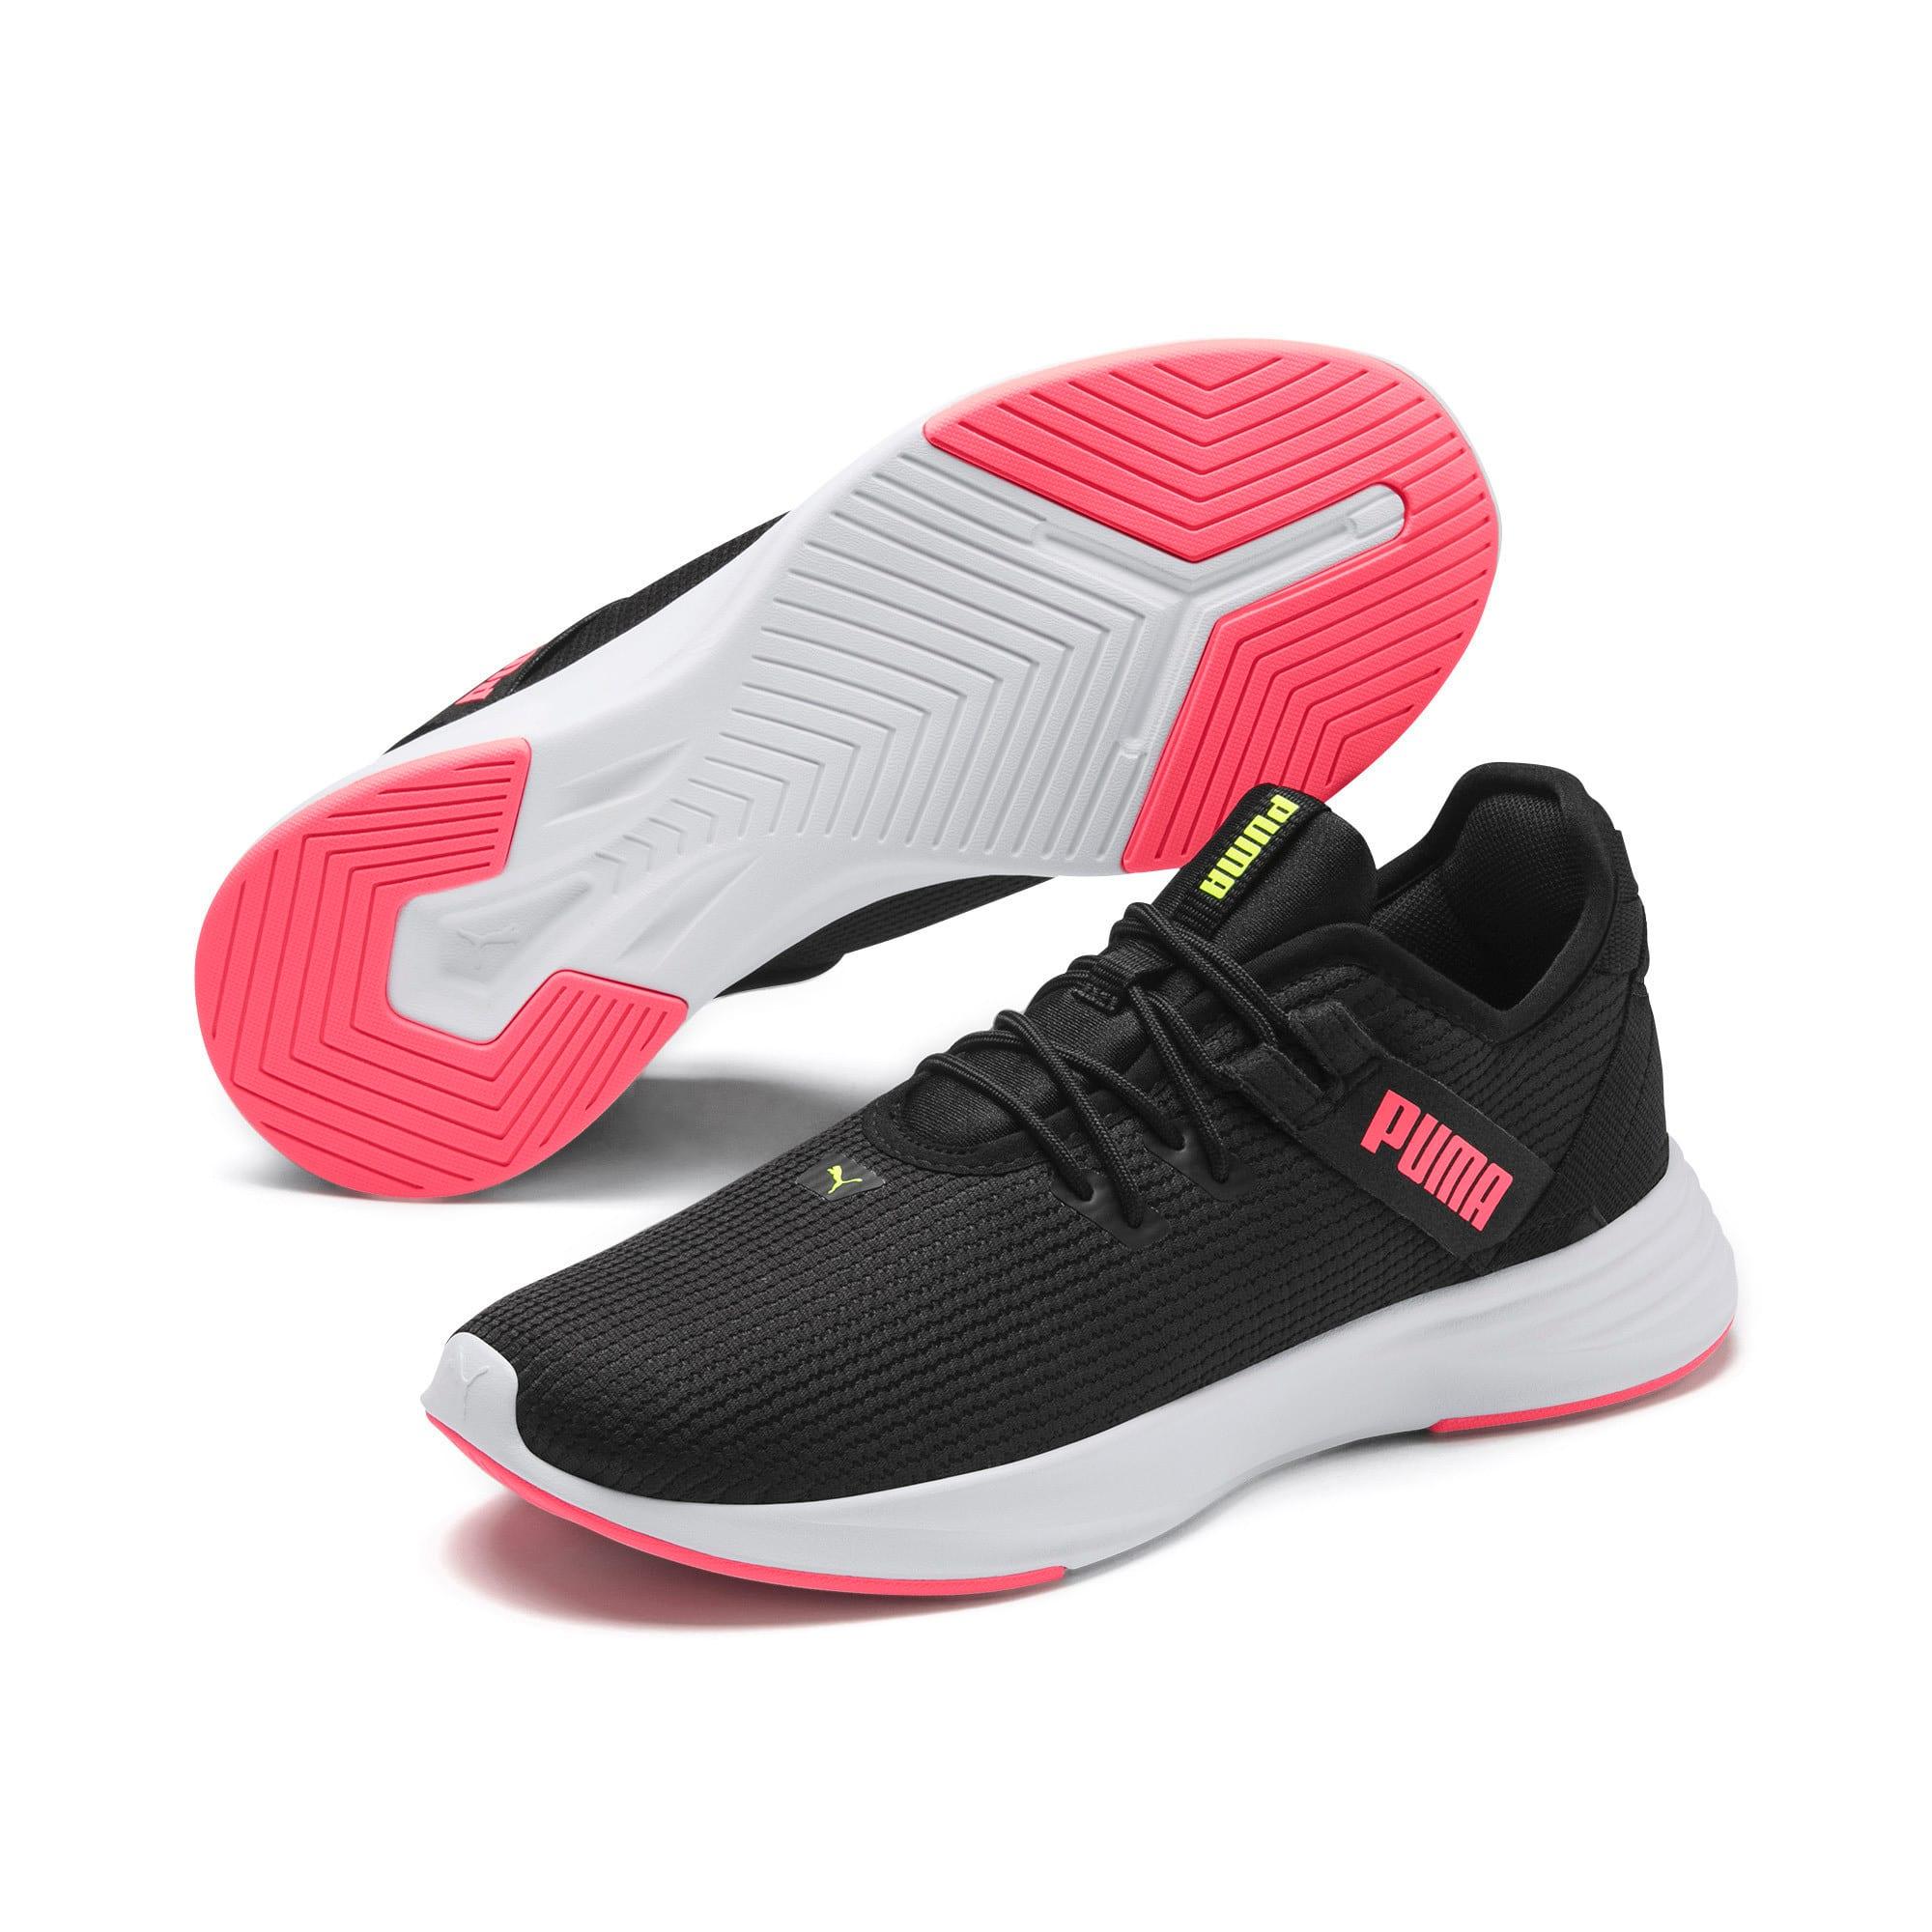 Thumbnail 4 of Radiate XT Women's Training Sneakers, Puma Black-Pink Alert, medium-IND